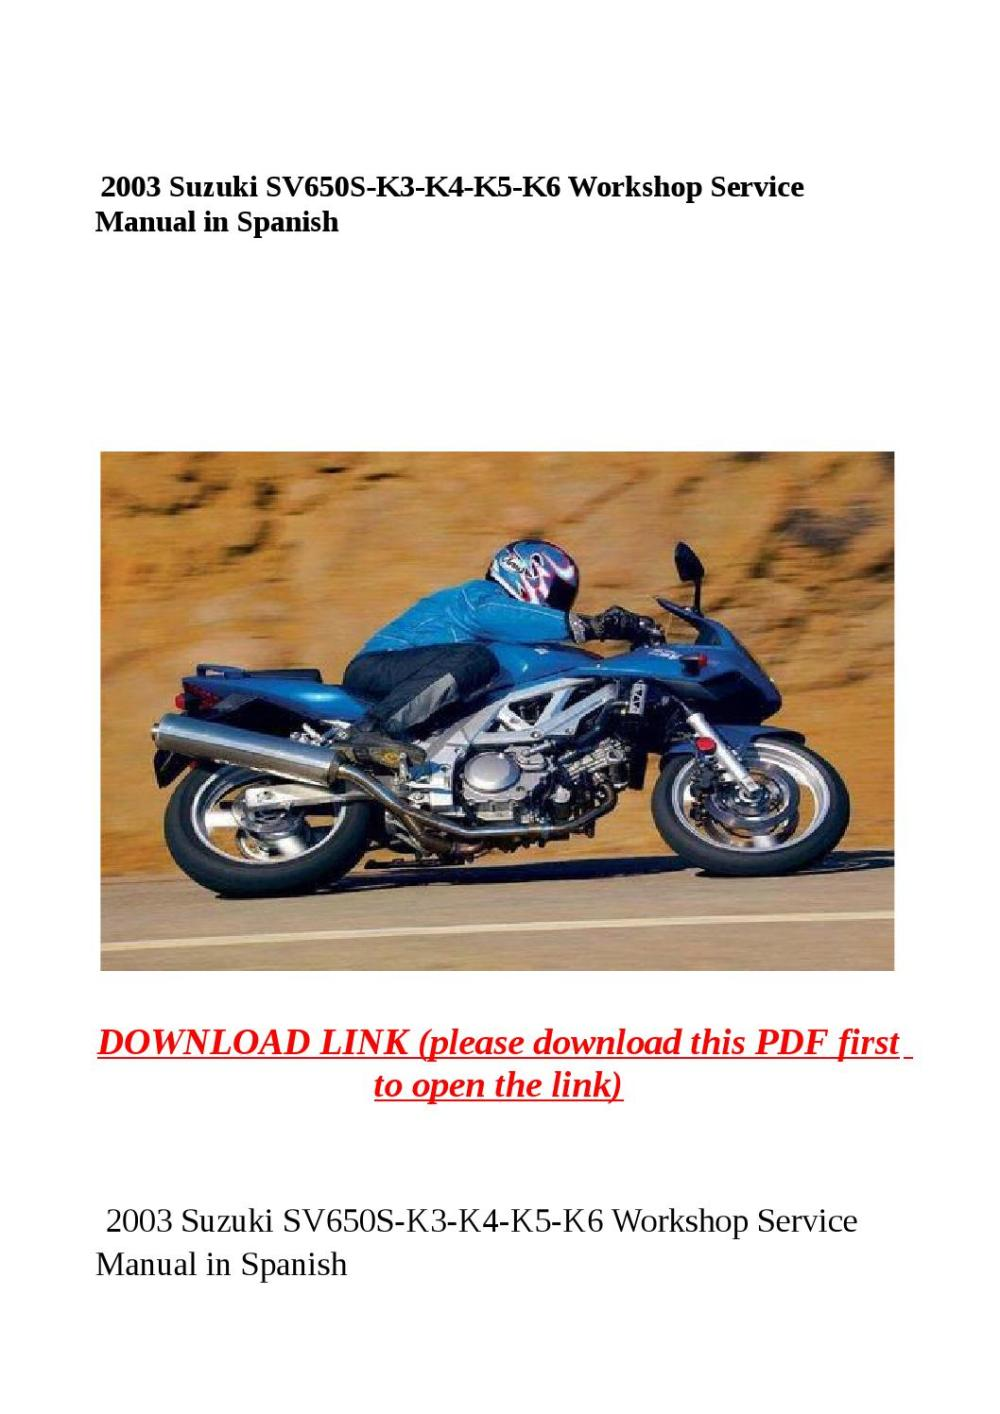 medium resolution of 2003 suzuki sv650s k3 k4 k5 k6 workshop service manual in spanish